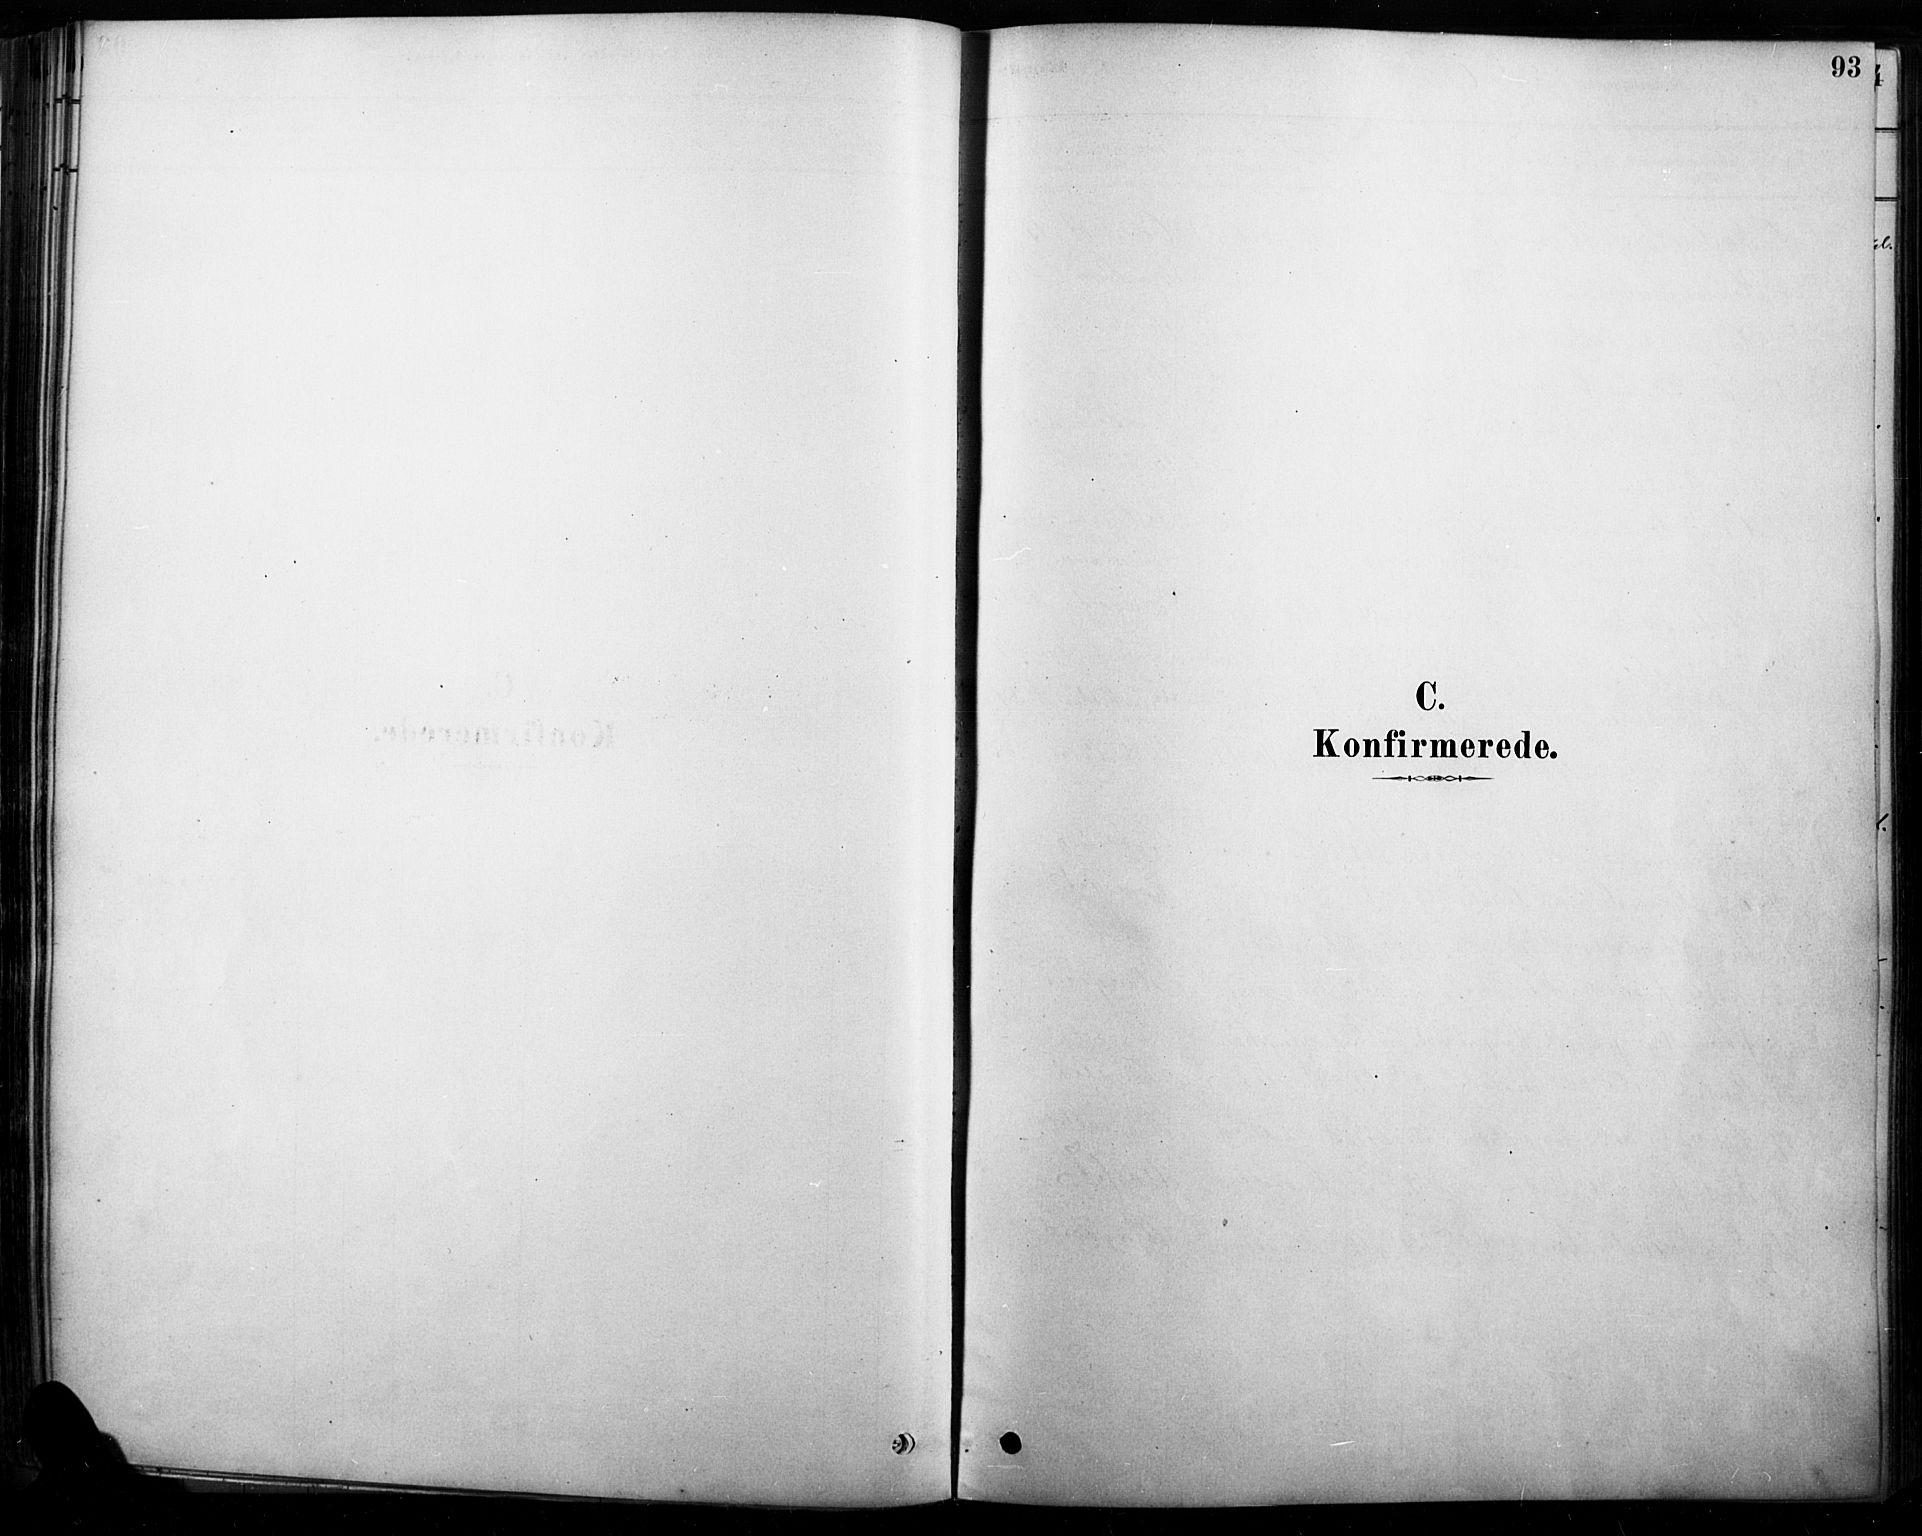 SAH, Rendalen prestekontor, H/Ha/Haa/L0009: Ministerialbok nr. 9, 1878-1901, s. 93